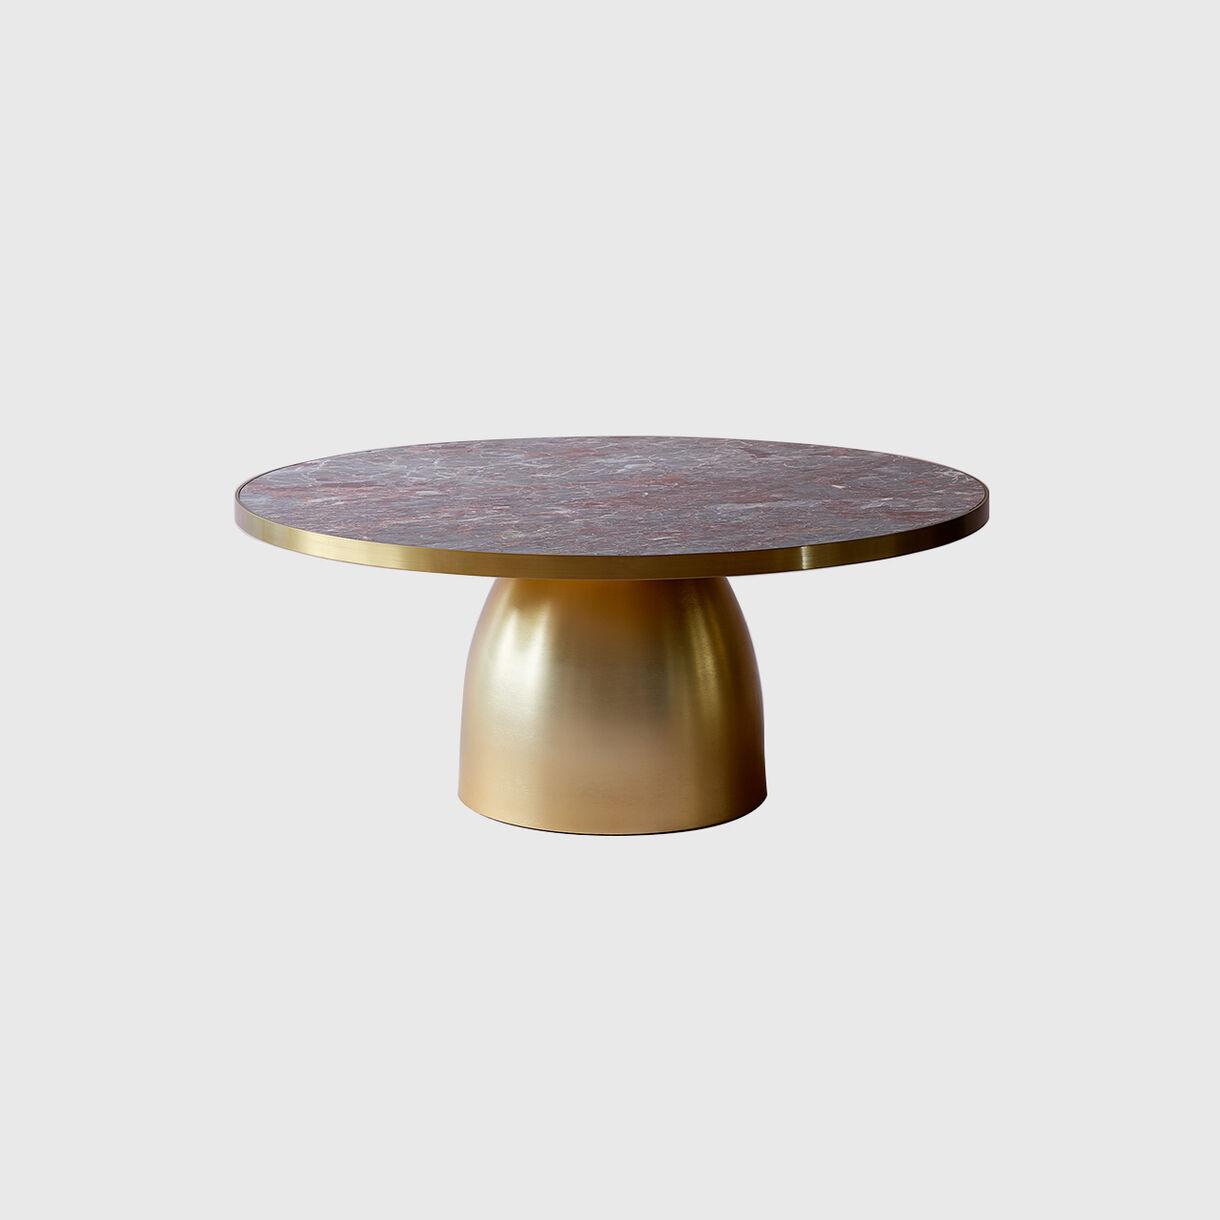 Lustre Coffee Table, Salome